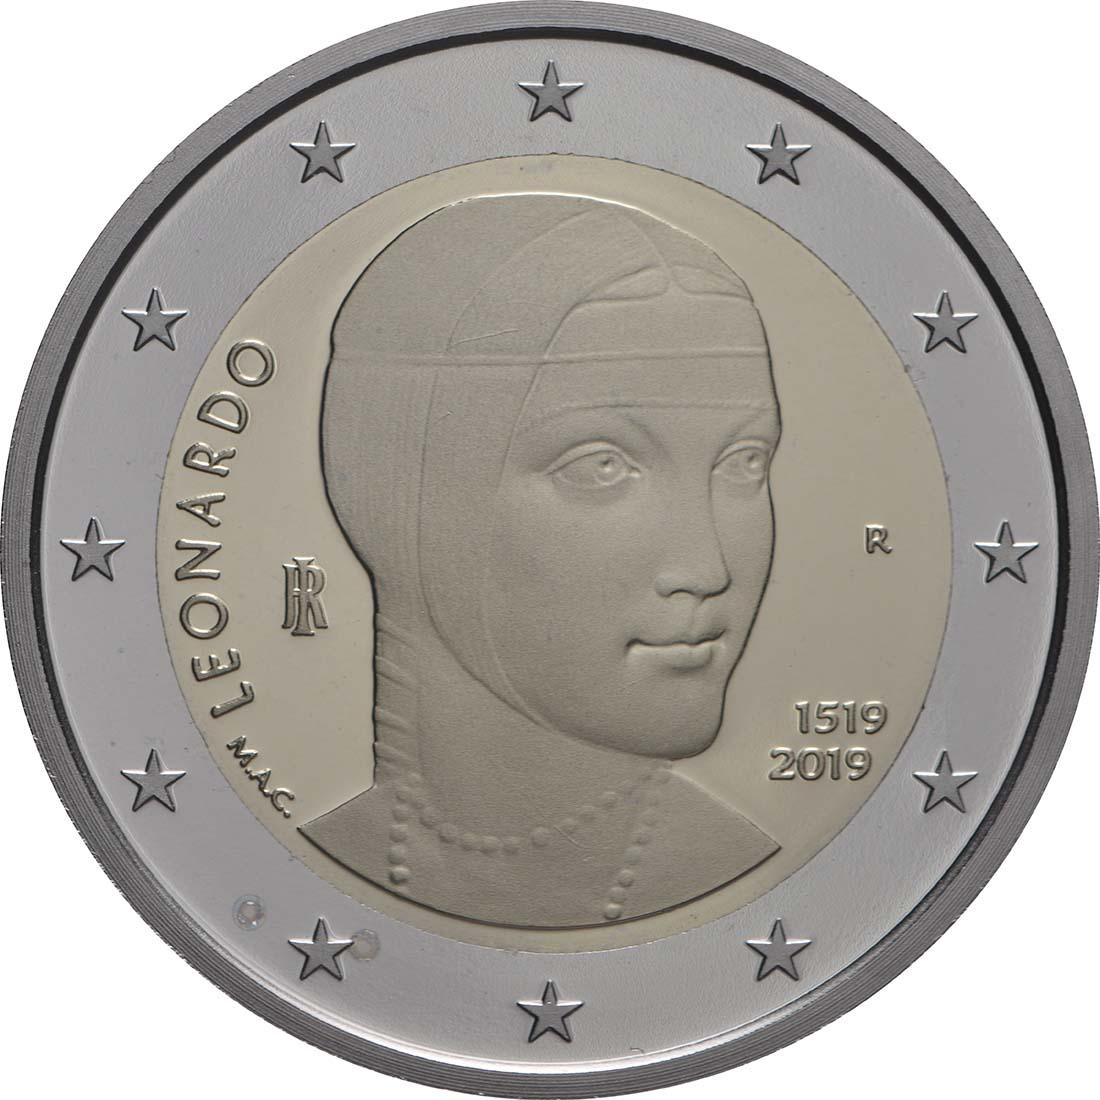 2019 335 Italien da Vinci.jpg